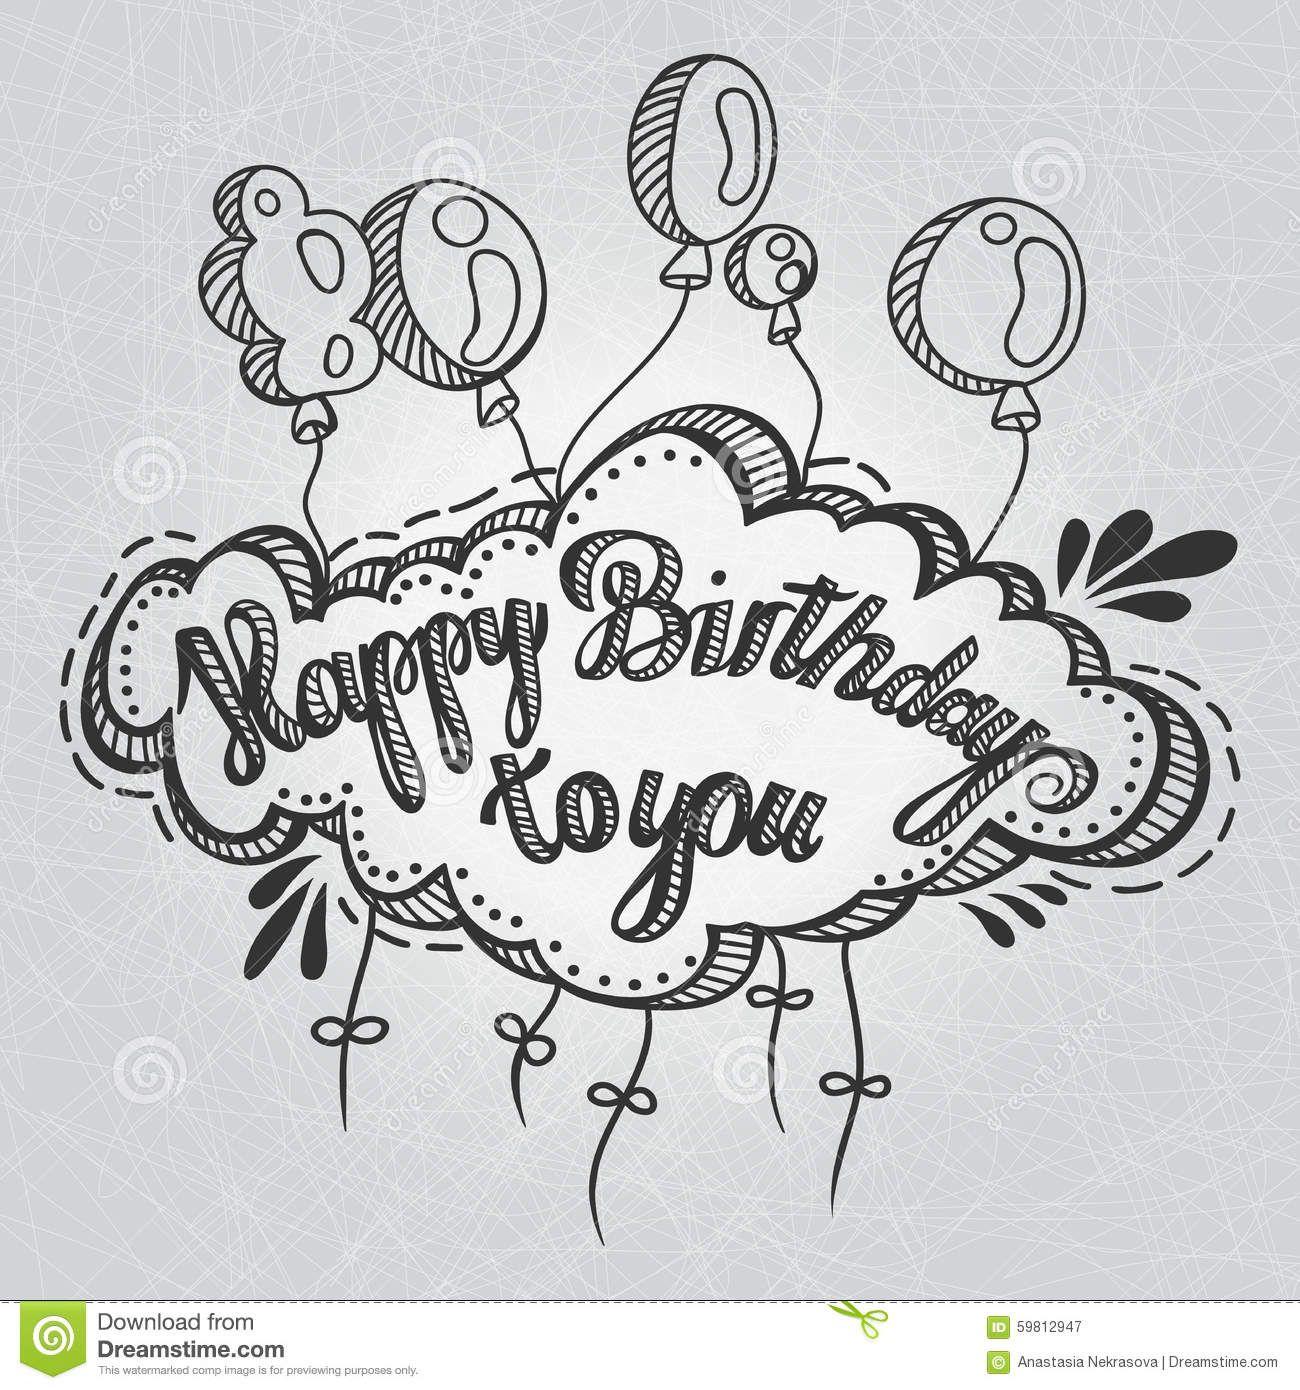 Drawn Birthday 8 Jpg 1 300 1 390 Pixels Happy Birthday Drawings